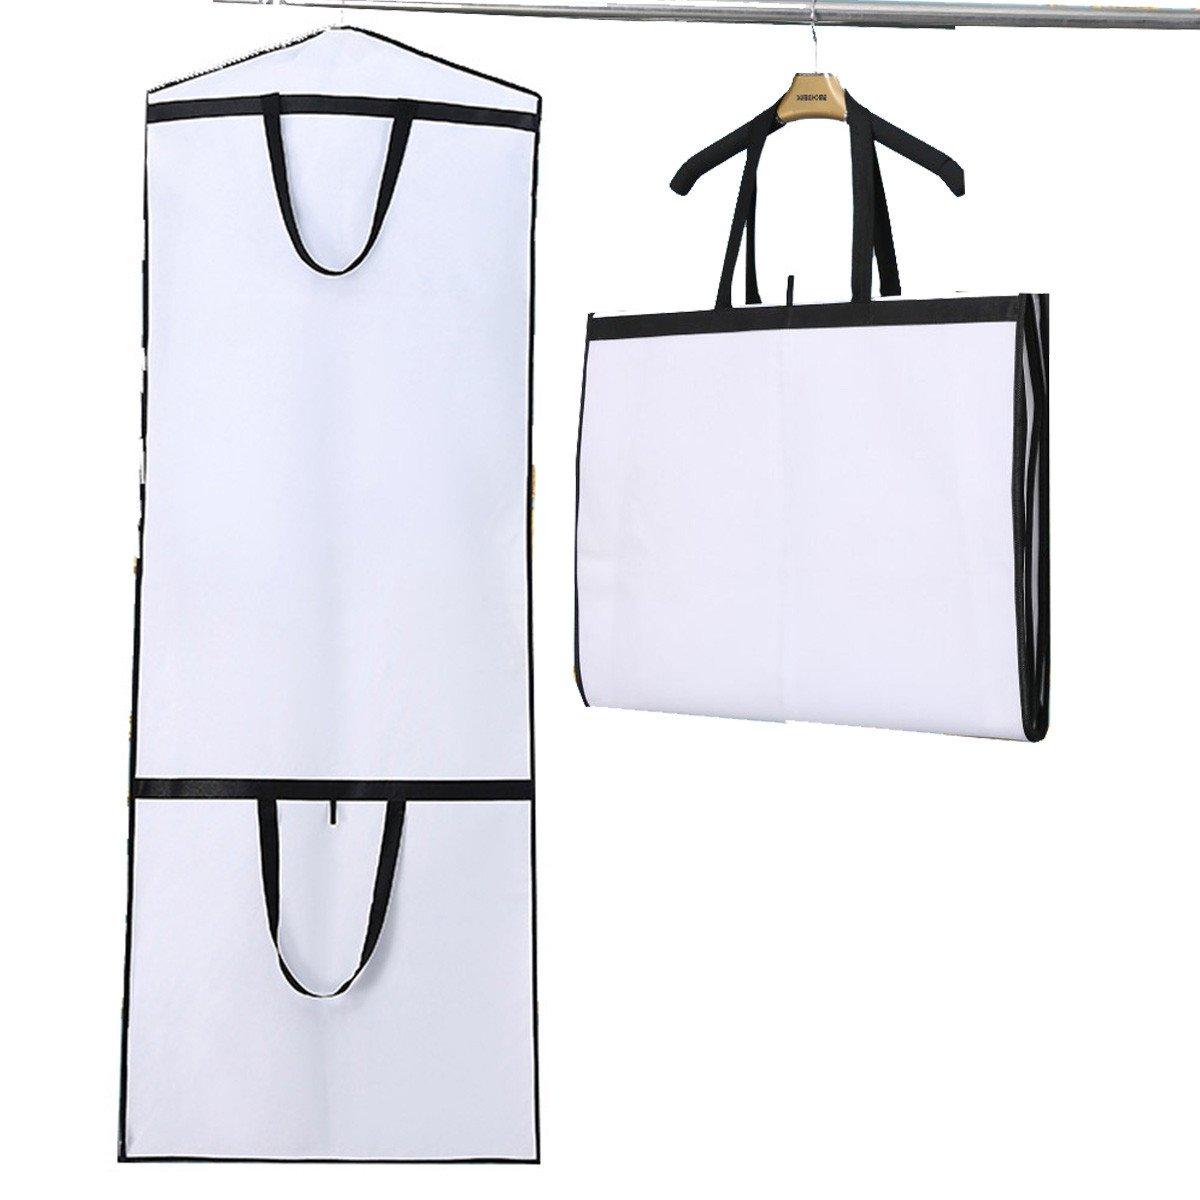 ARHSSZY 1pc 180cm 360 Degree Dustproof Non-woven Bridal Dress Gown Protection Cover Wedding Dress Garment Bag Storage Bag (White)